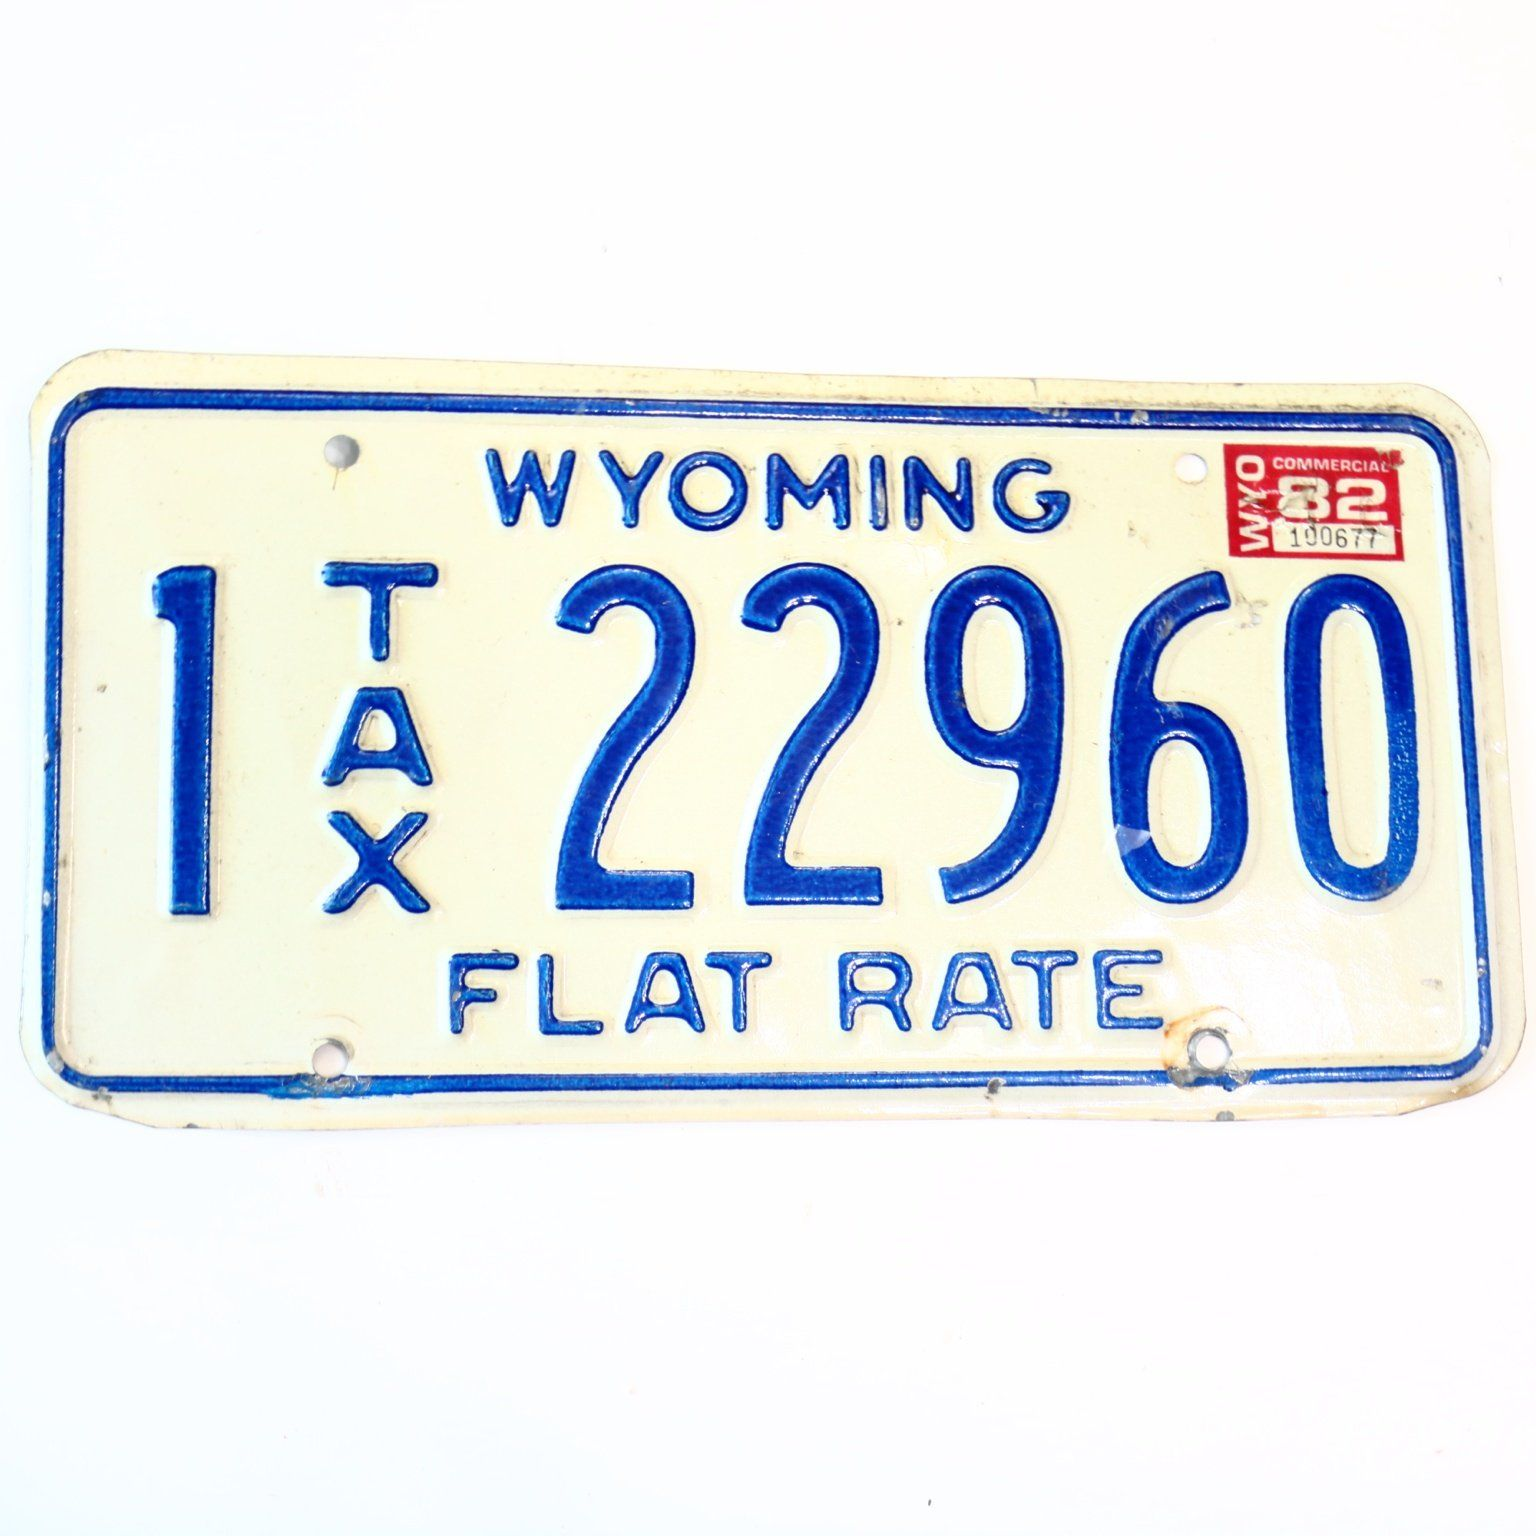 1982 Wyoming Flat Tax Natrona County License Plate 22960